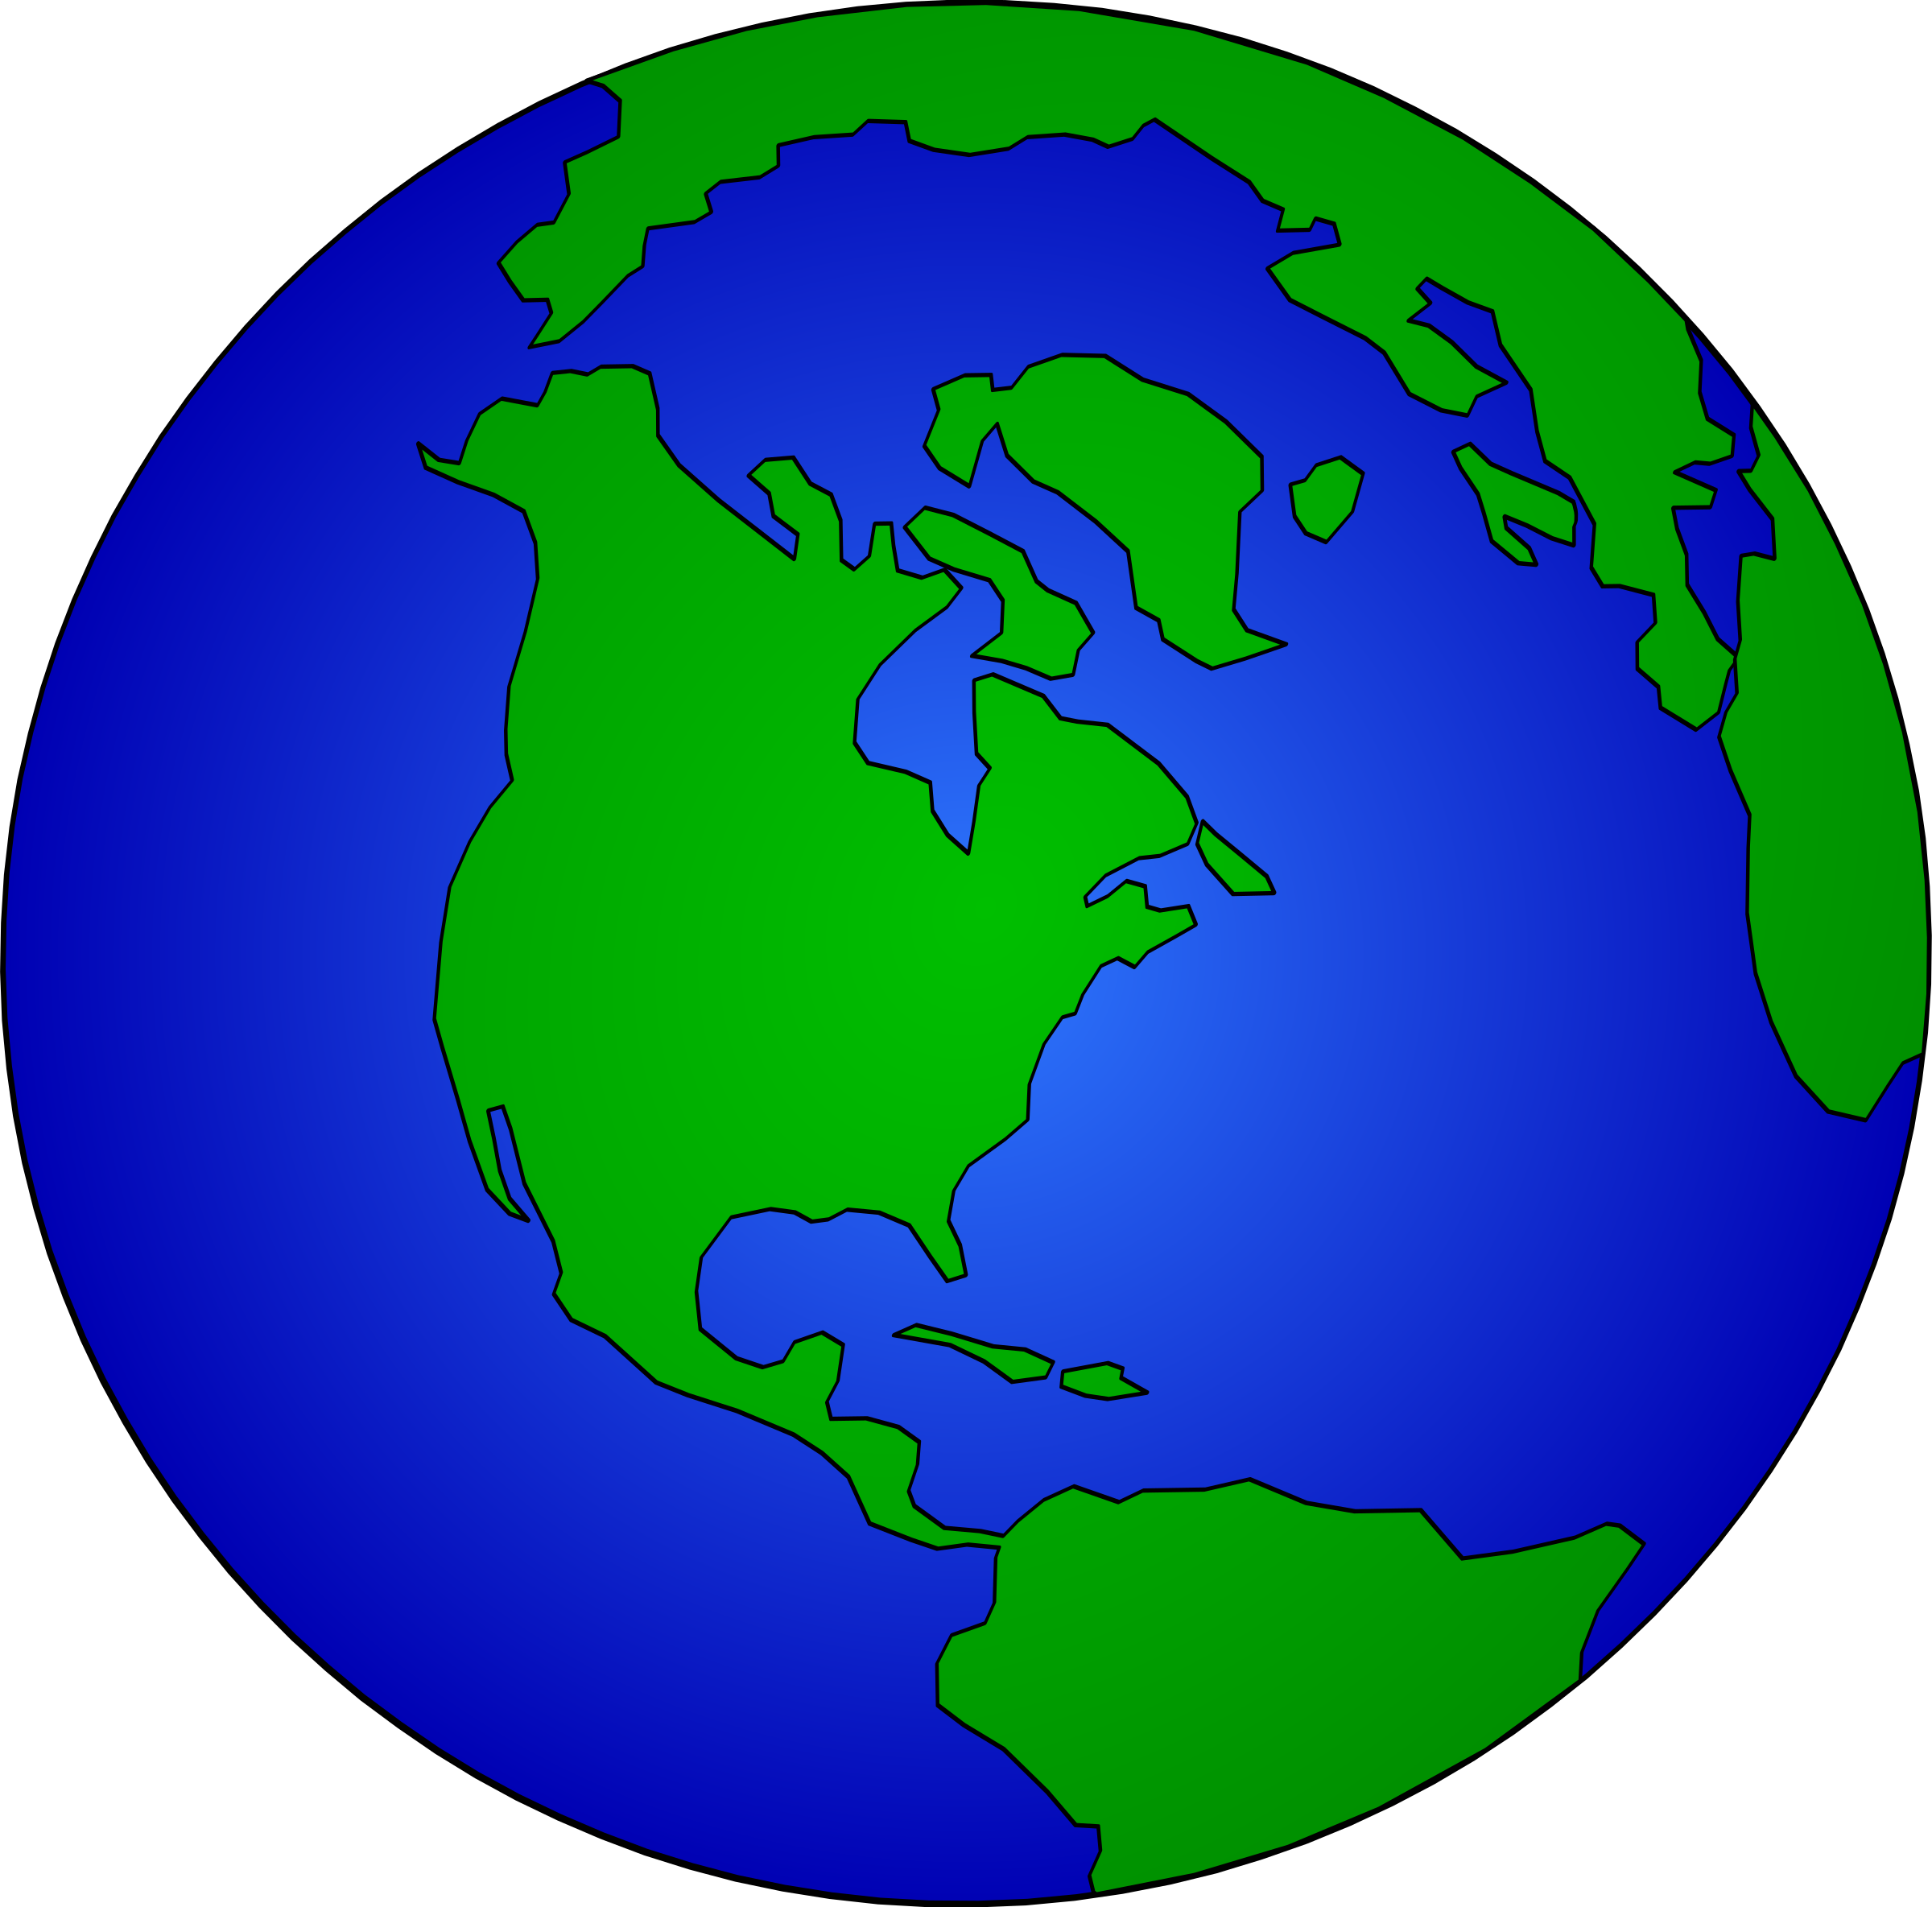 Globe clipart cartoon. Earth dan gerhrad r